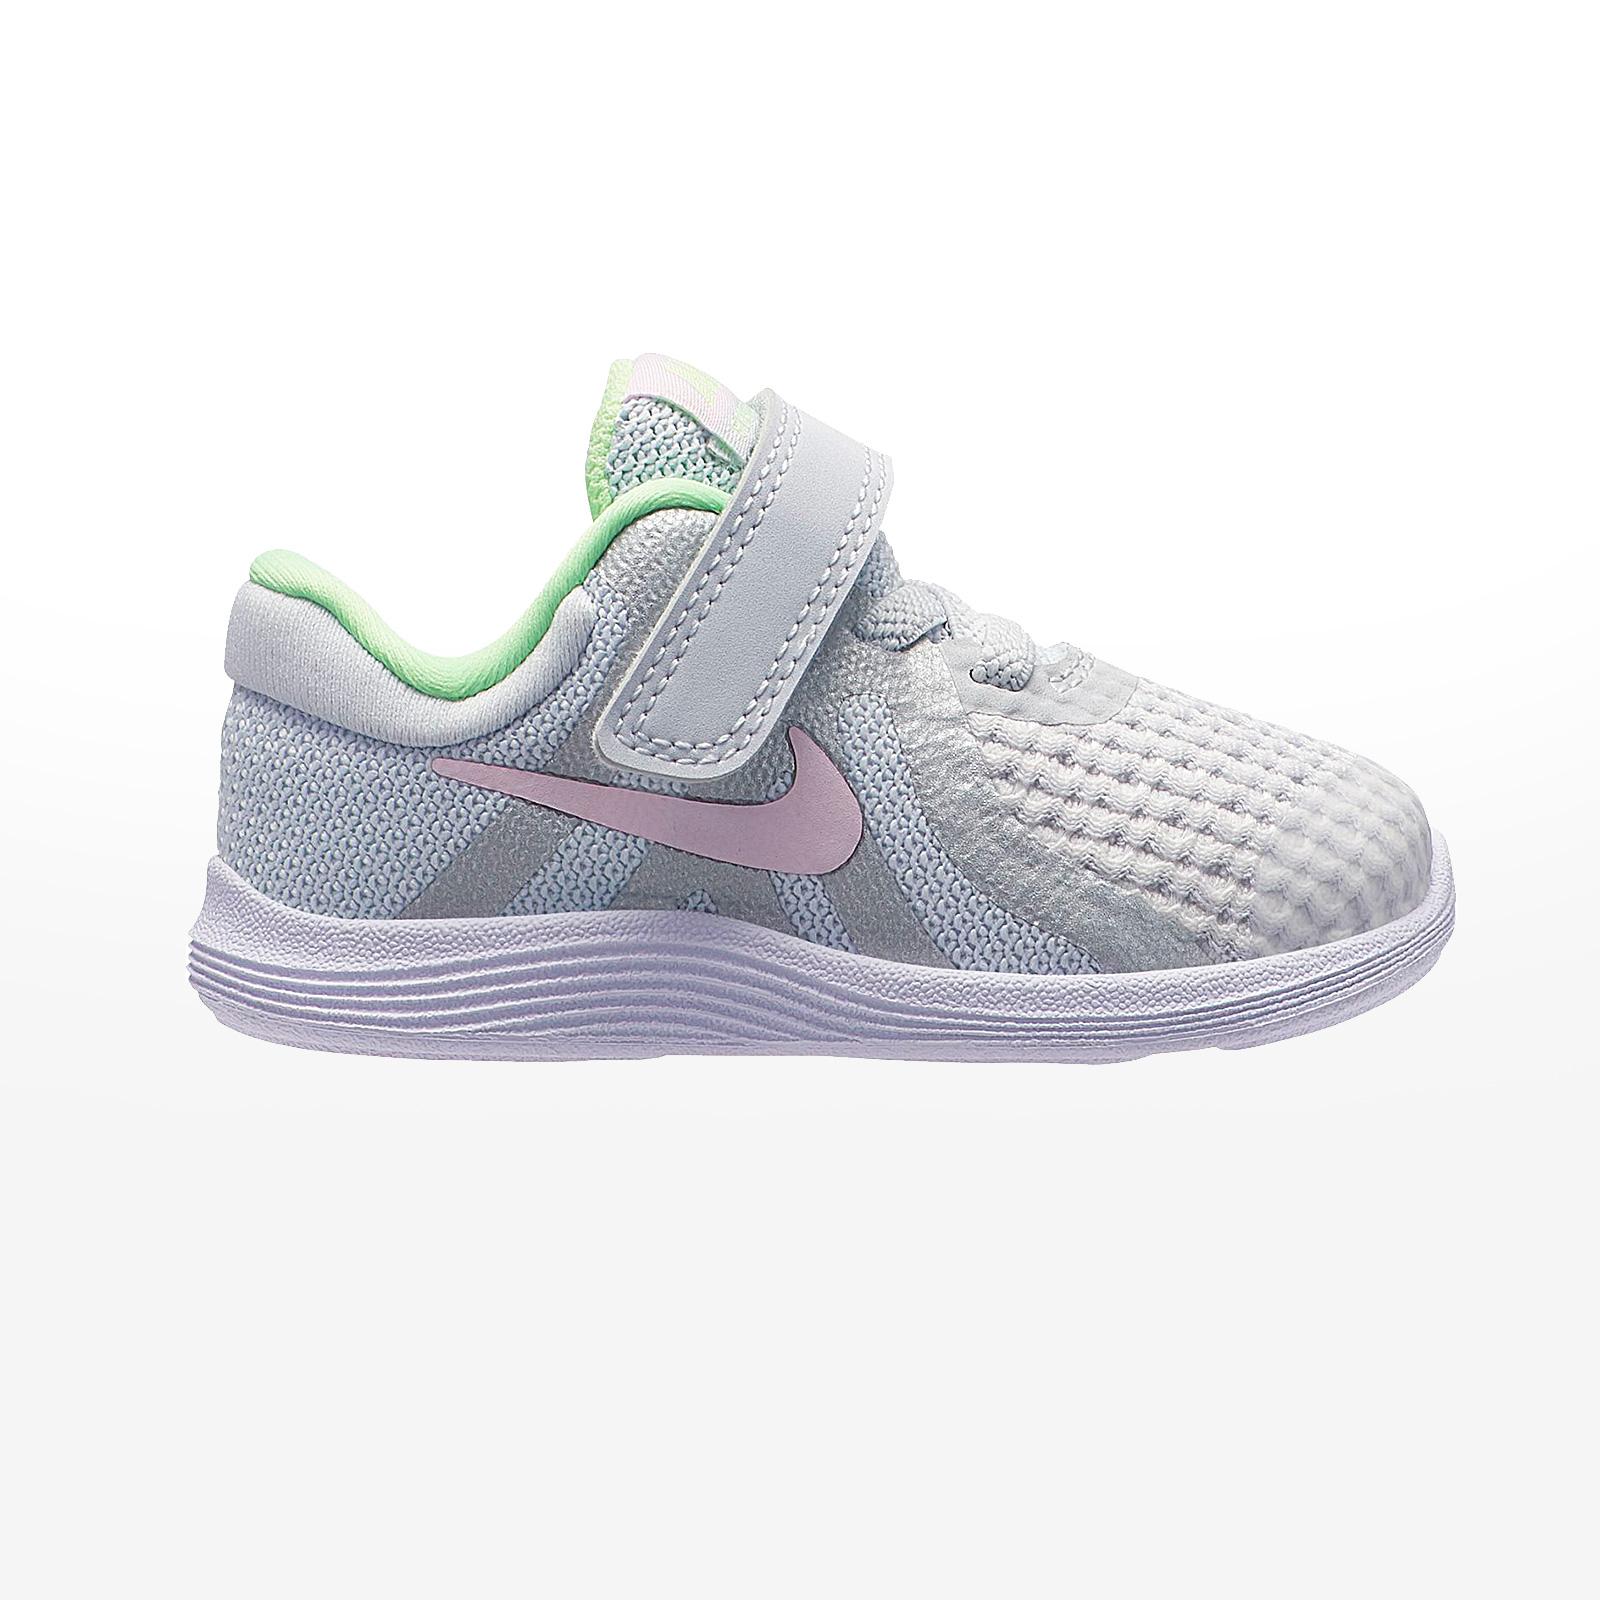 competitive price 2ce1b e60b6 Sportcafe Nike – NIKE REVOLUTION 4 (TDV) – PURE PLATINUM PINK FOAM -PLATINUM